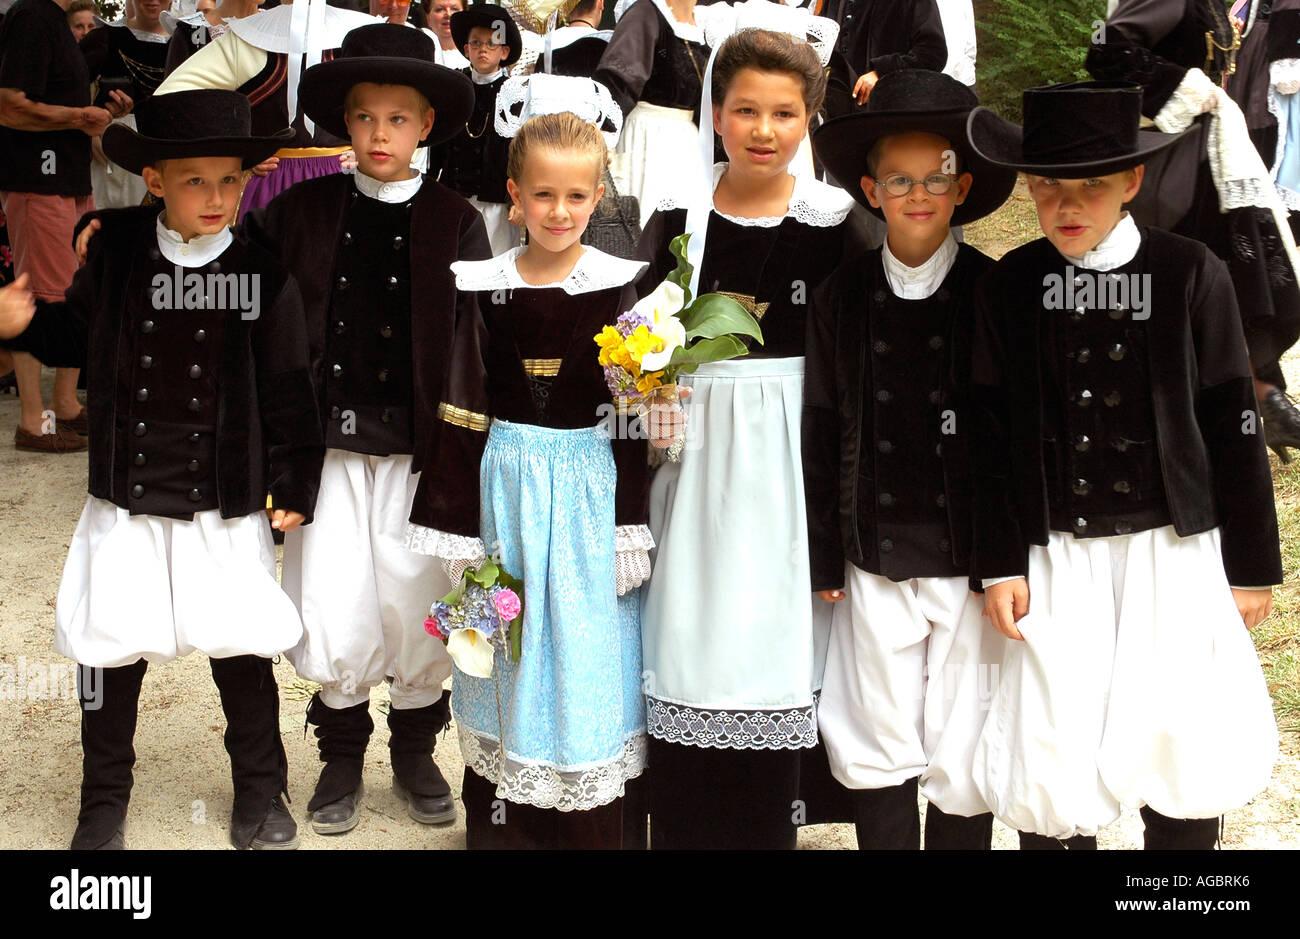 Kinder tragen traditionelle Kostüme Breton in einem Sommer-Folklore-Festival in der bretonischen Dorf von La Forêt-Fouesnant Stockbild